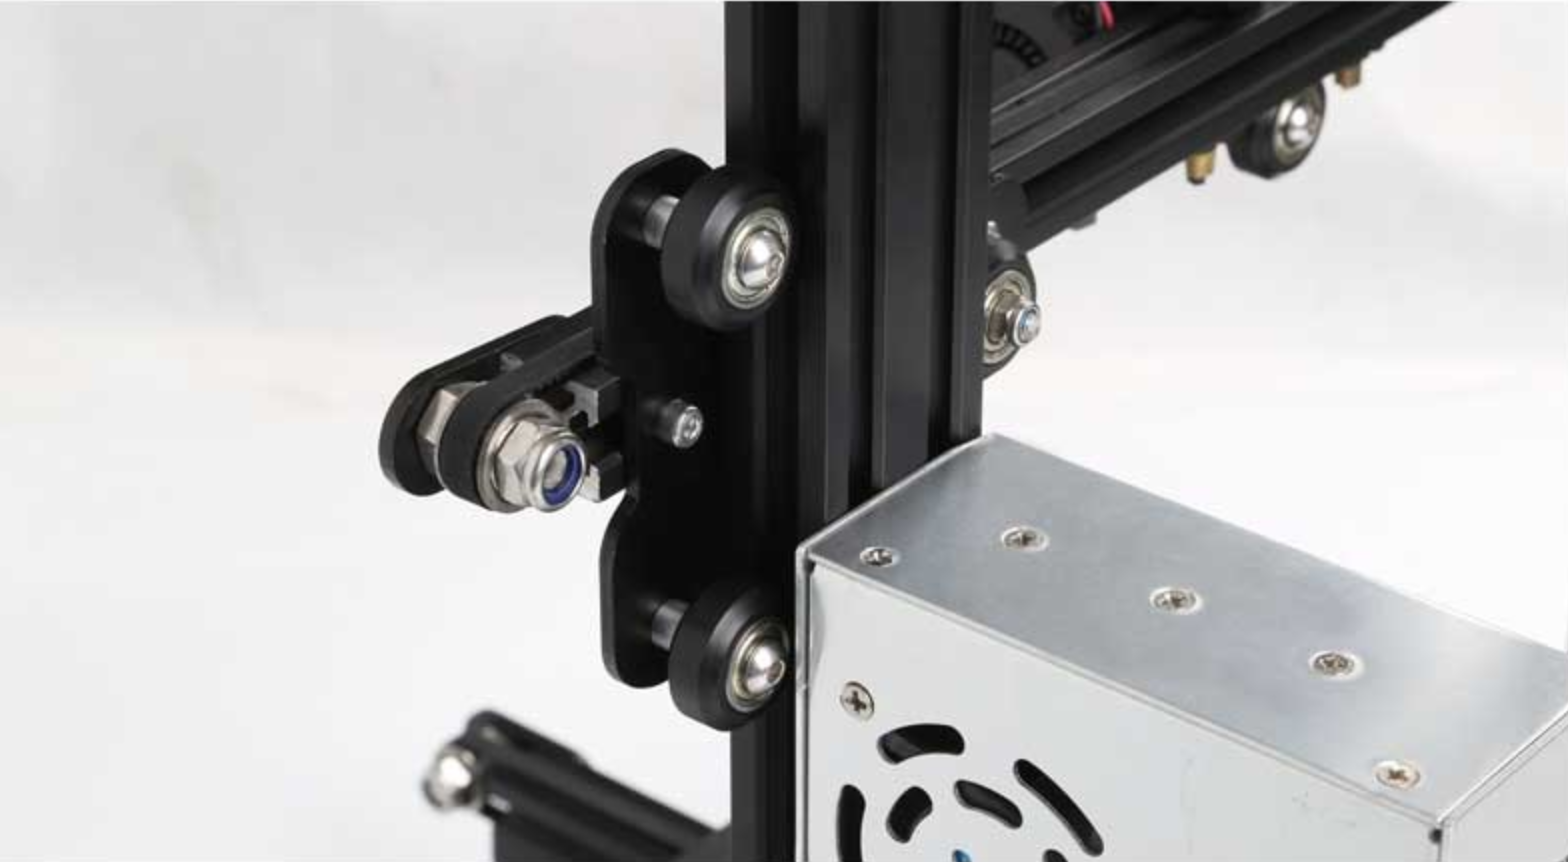 Creality Ender 3 3D printer | 220x220x250mm Build Volume